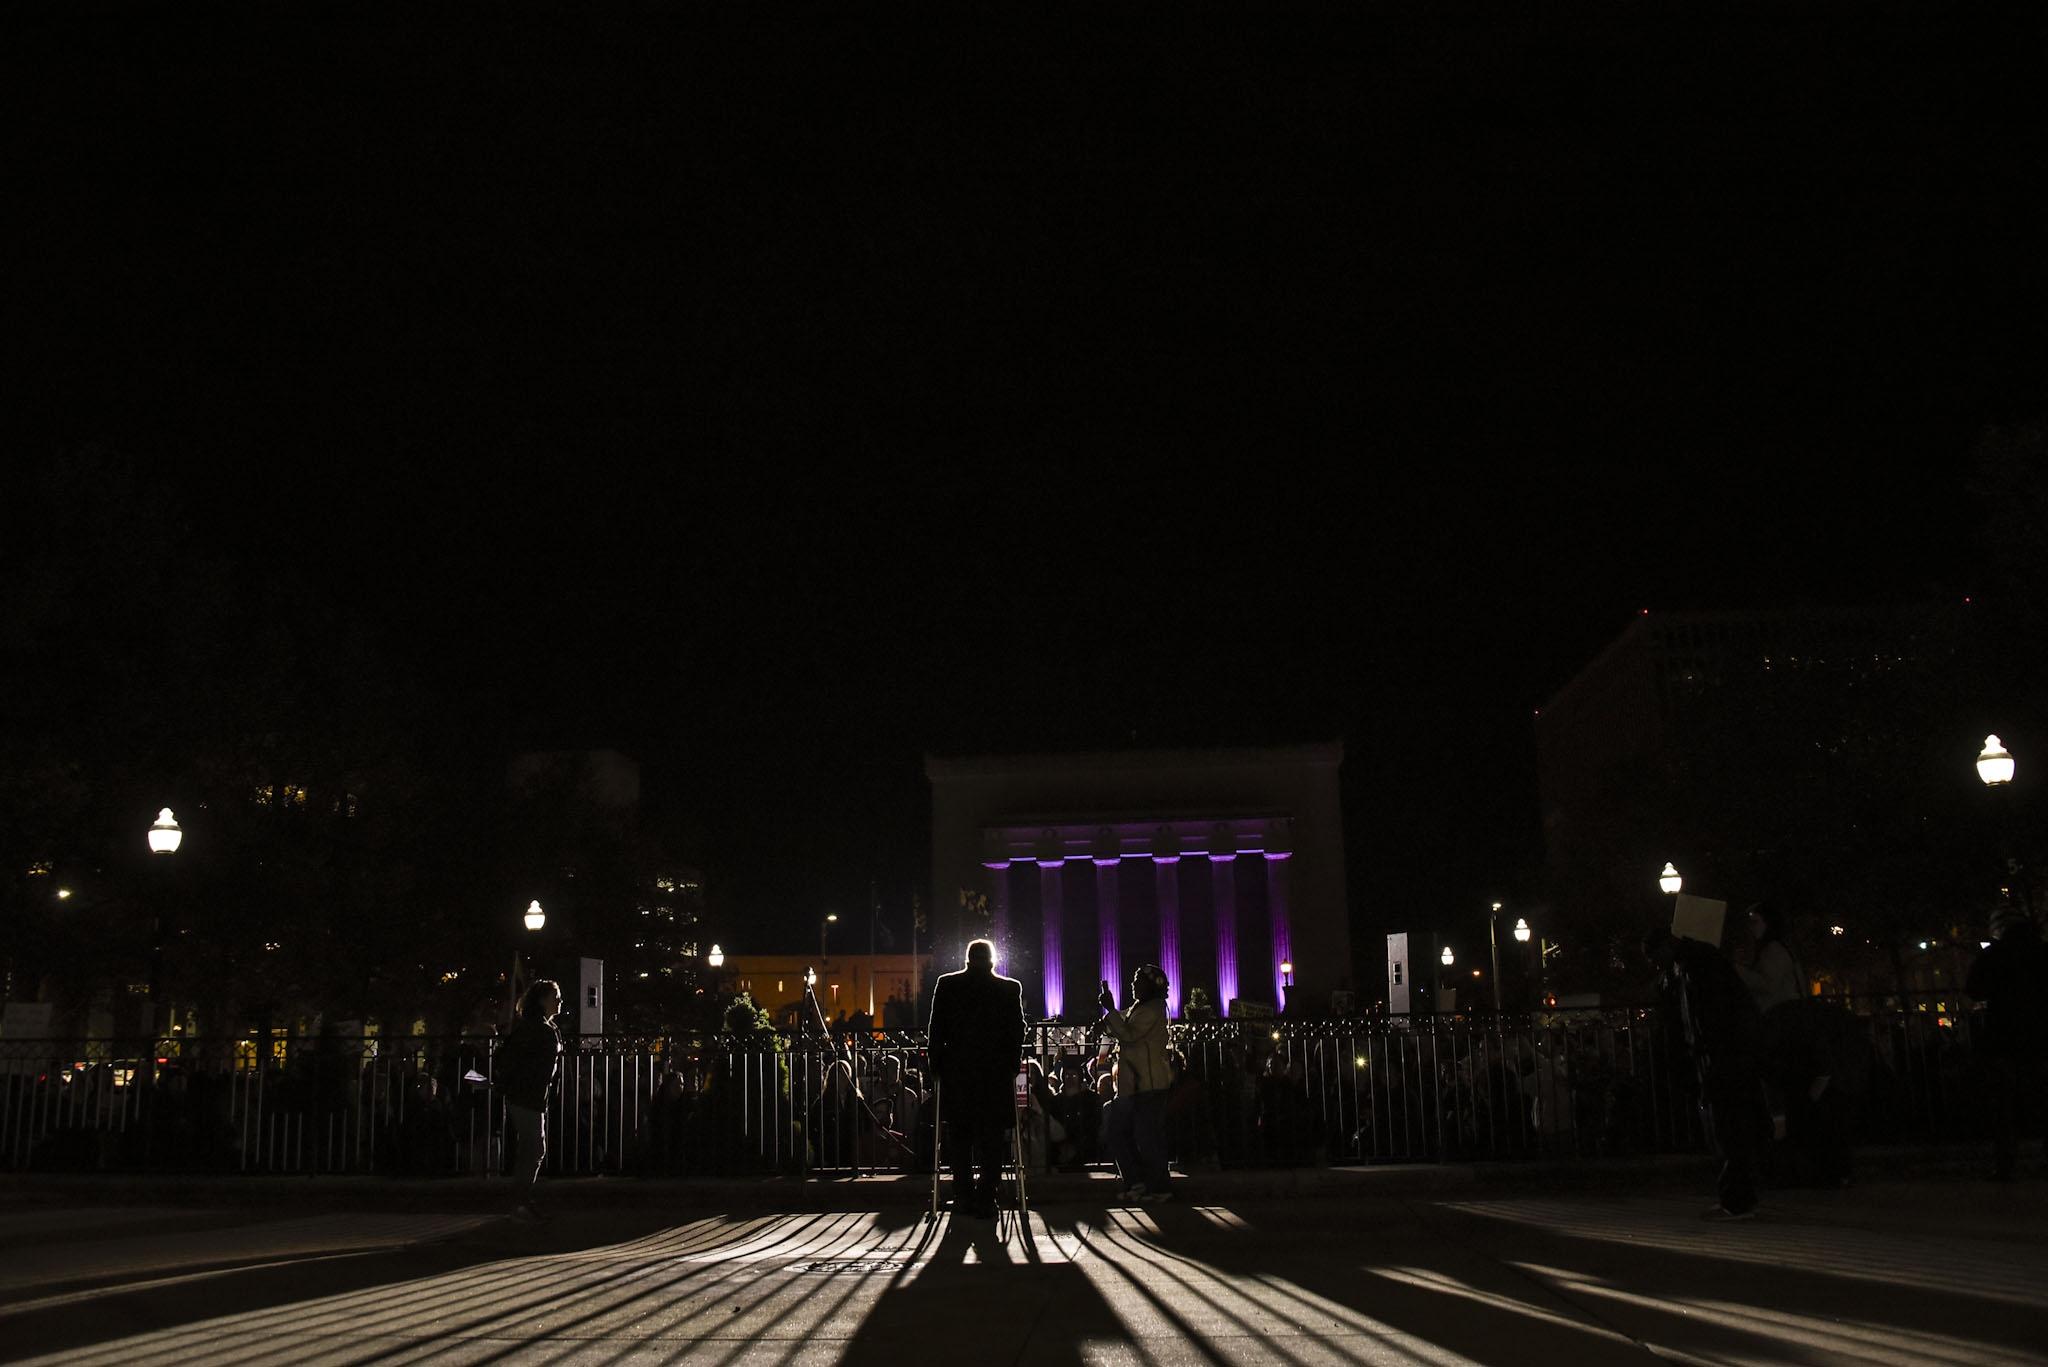 November 2018: Congressman Elijah Cummings addresses a crowd in Baltimore.